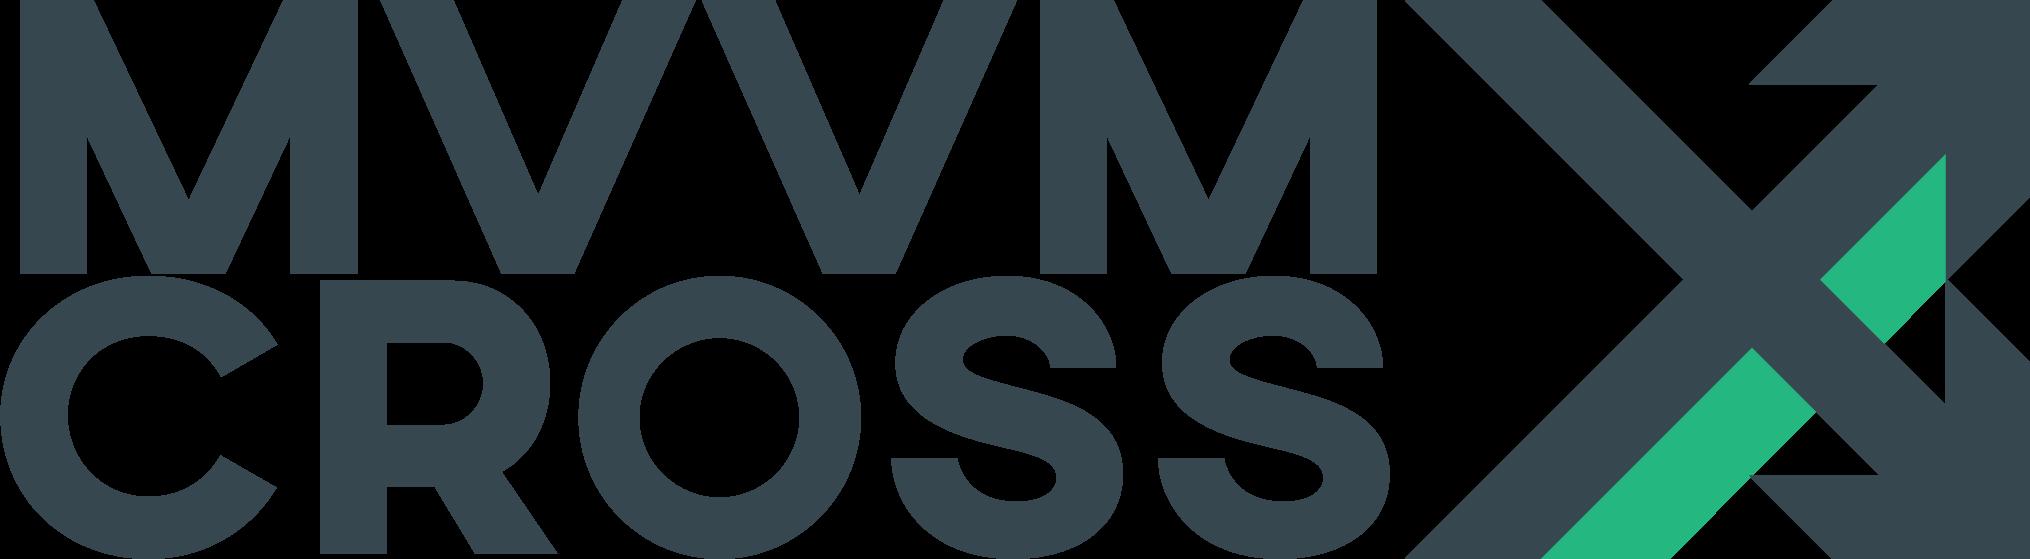 Navigation | MvvmCross